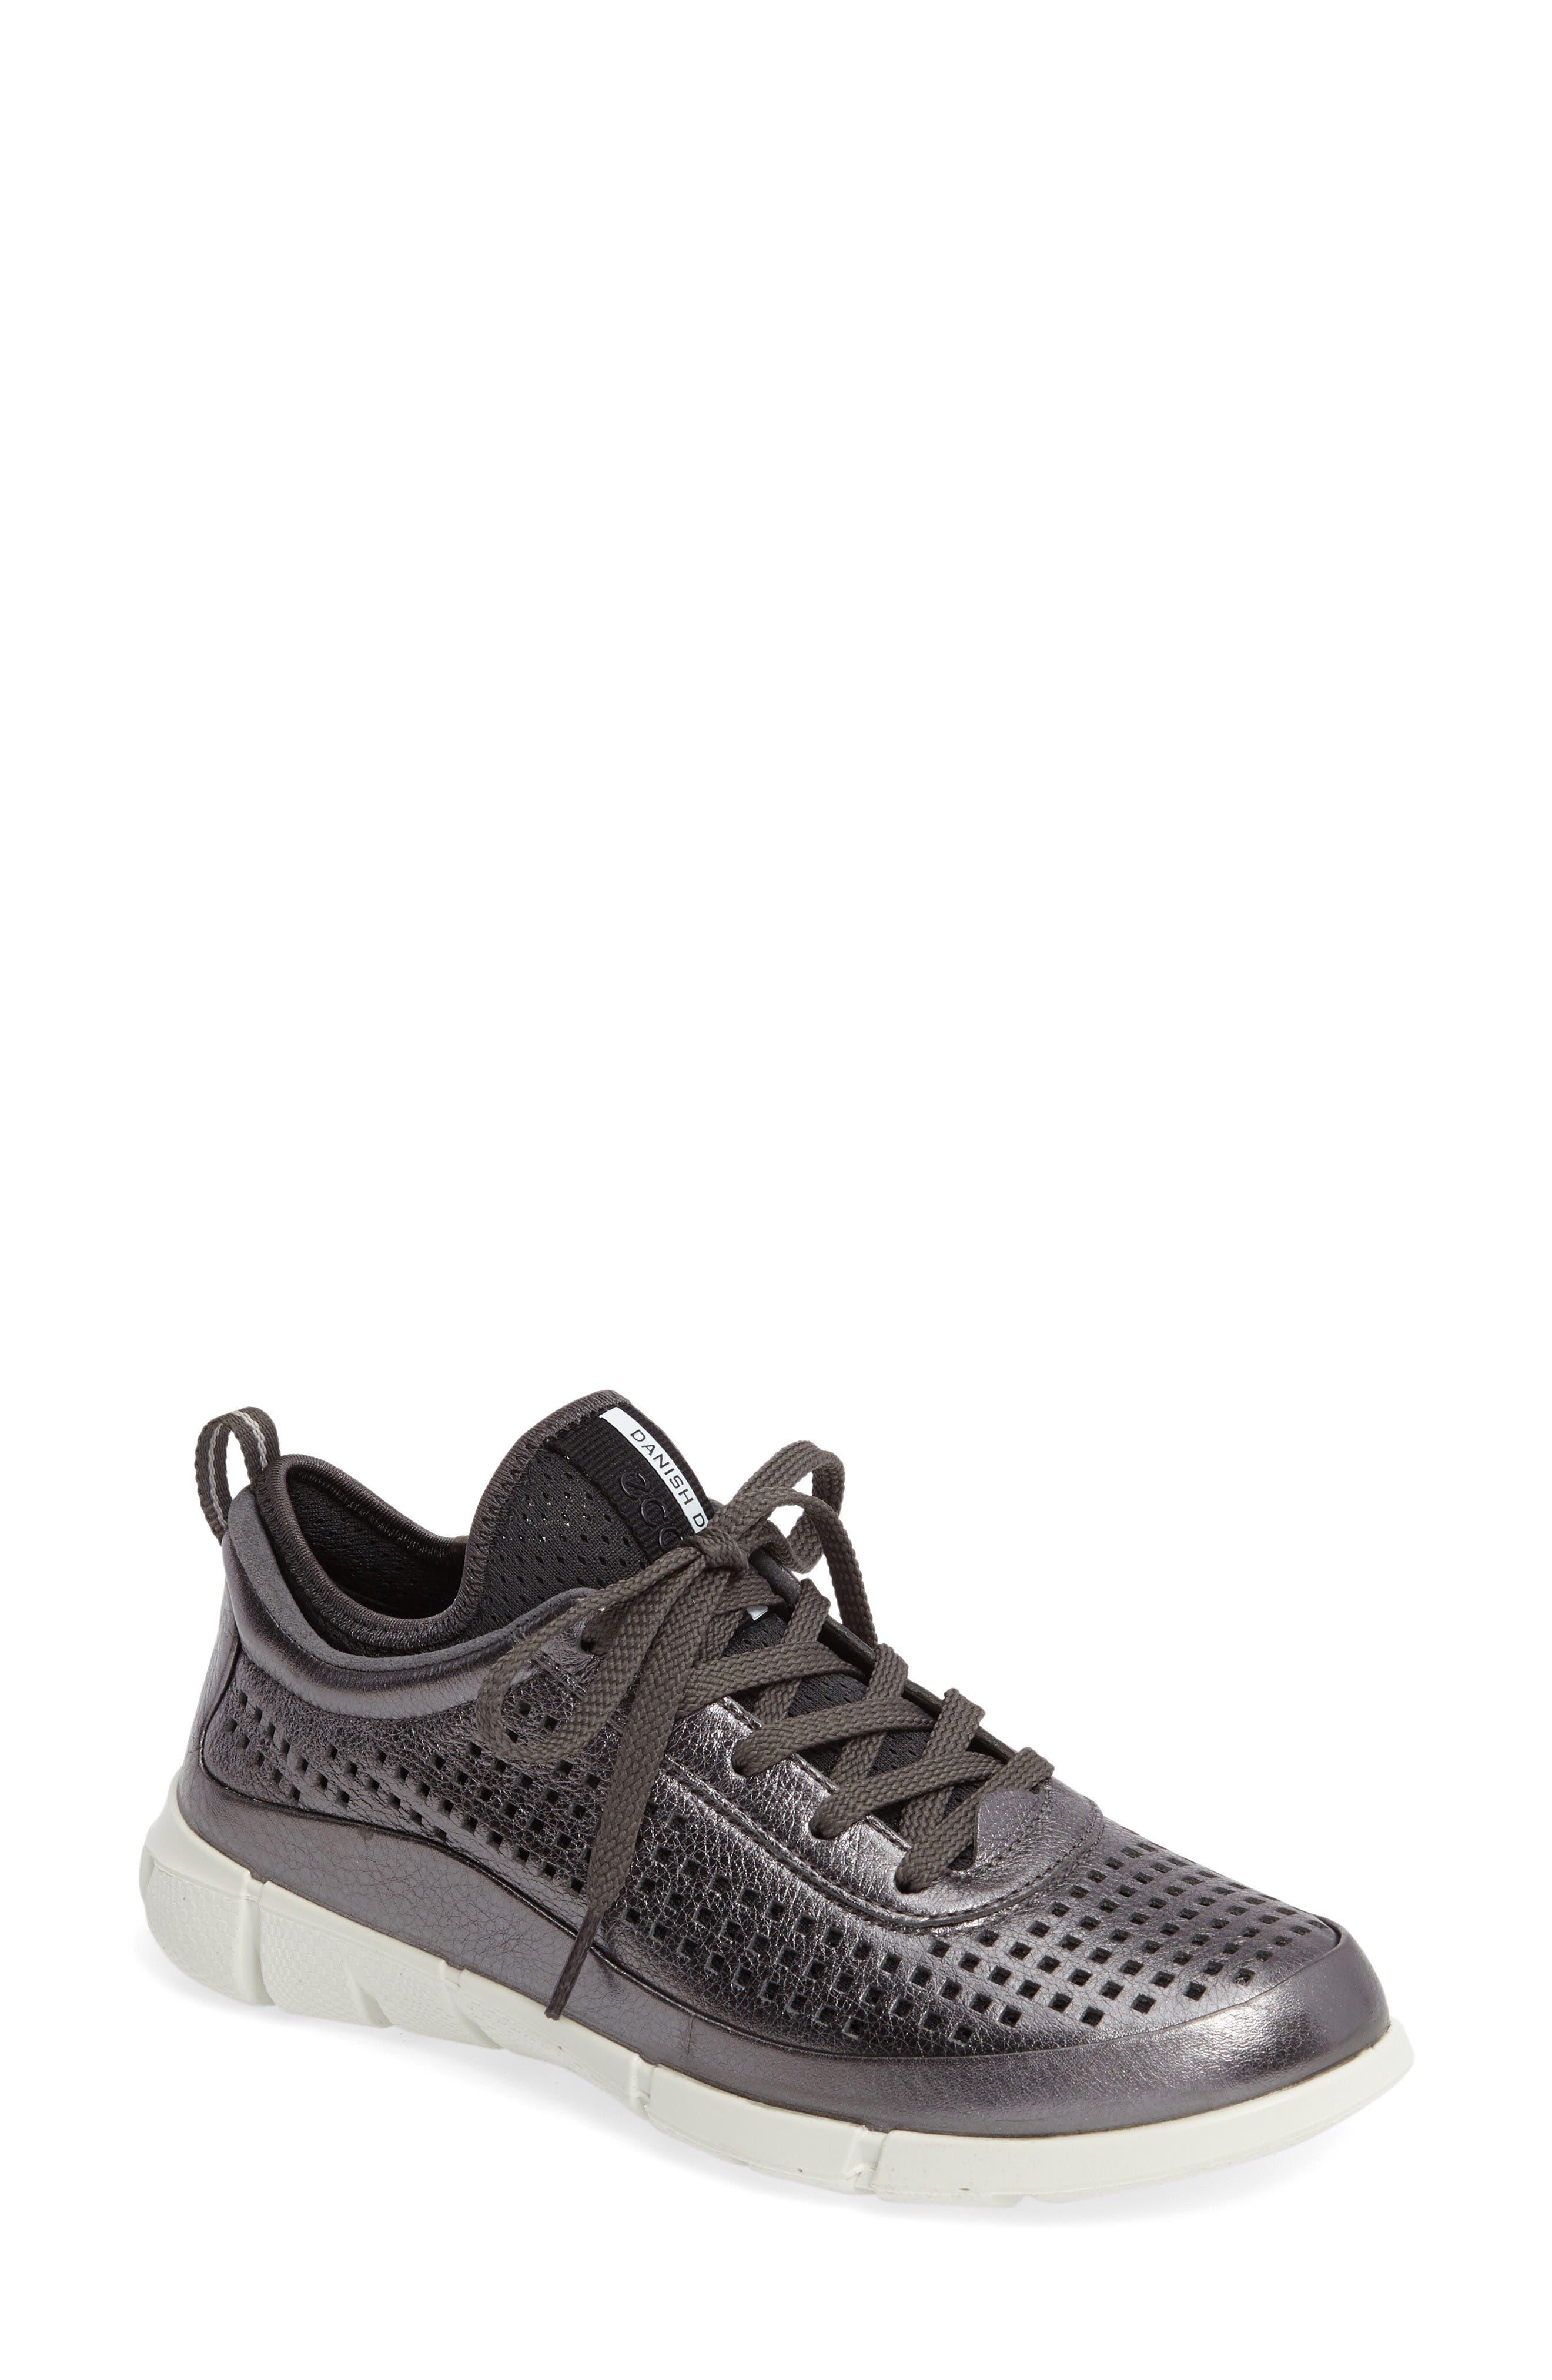 Main Image - ECCO 'Intrinsic' Leather Sneaker (Women)